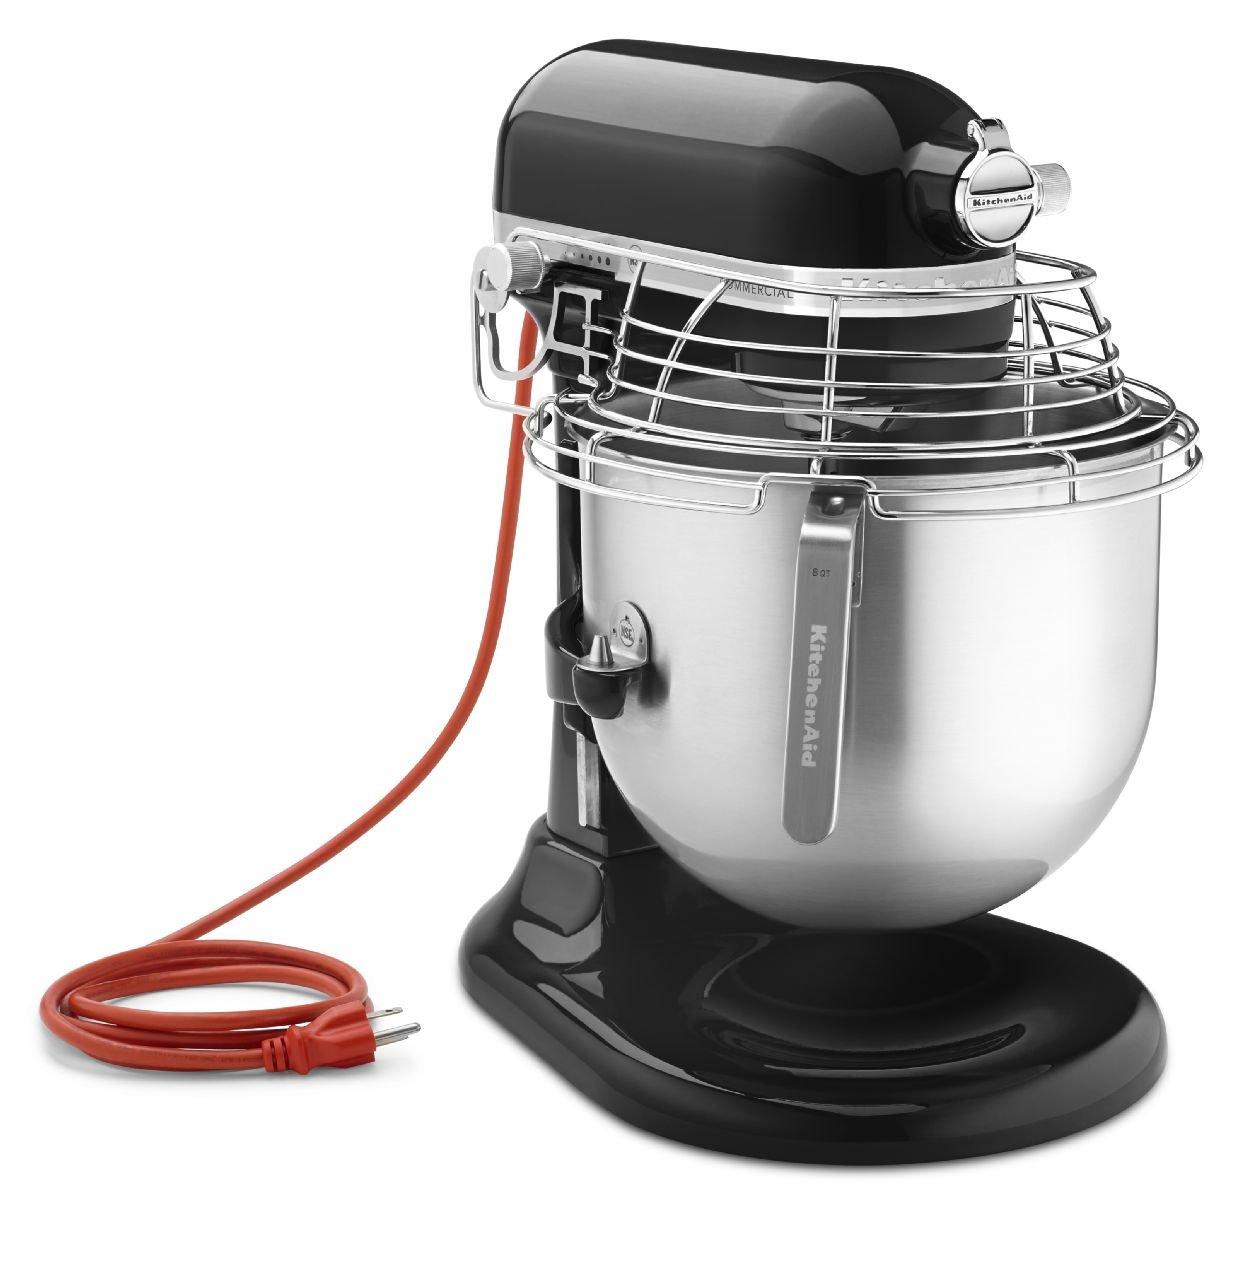 Amazon.com: KitchenAid (KSMC895OB) 8-Quart Stand Mixer with Bowl ...